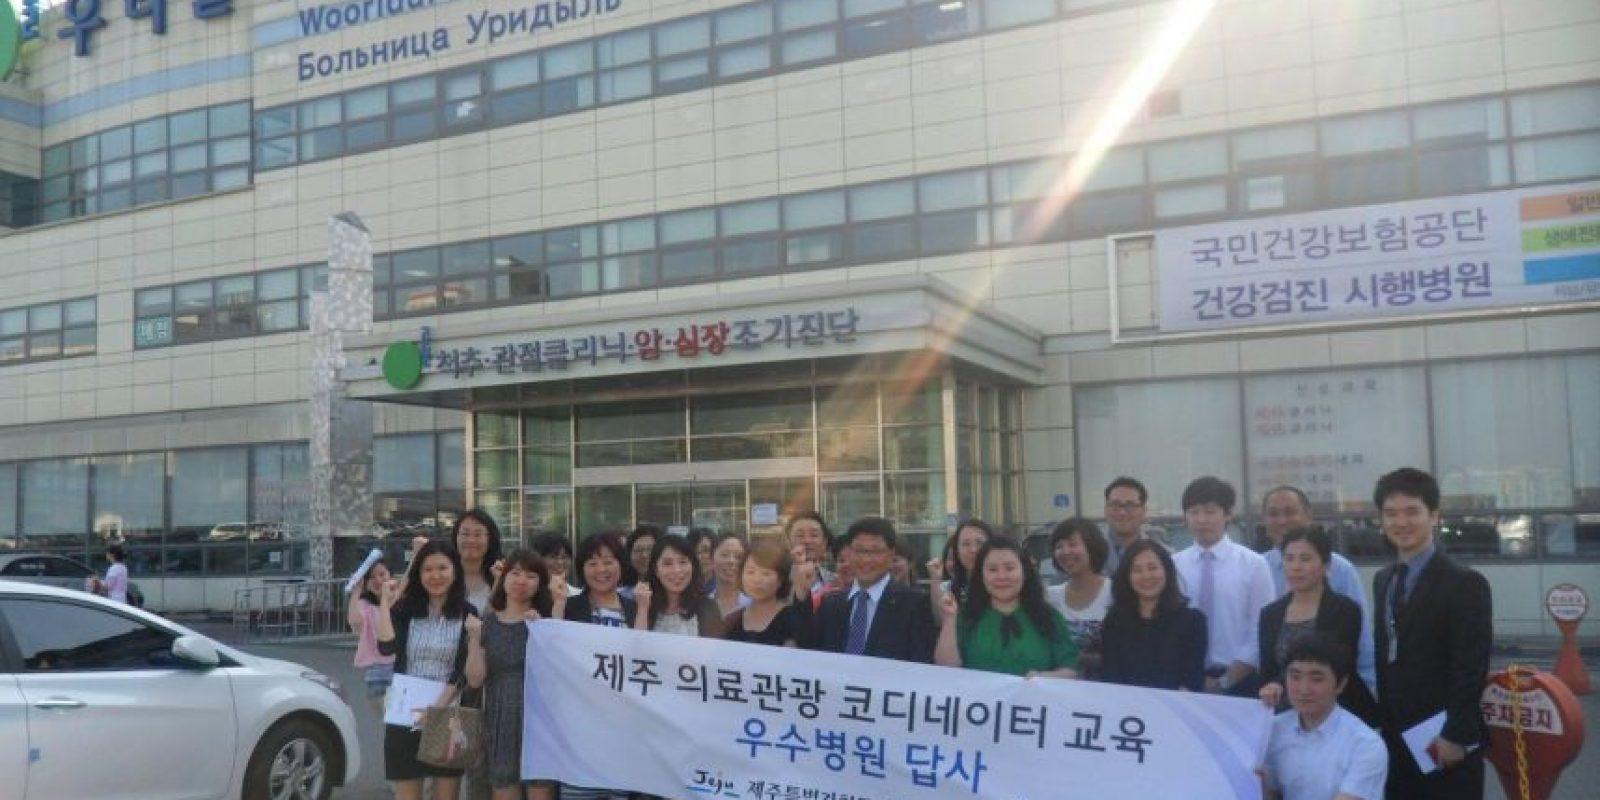 8. Wooridul Spine Hospital, en Corea del Sur Foto:Facebook.com/WooridulSpineHospital